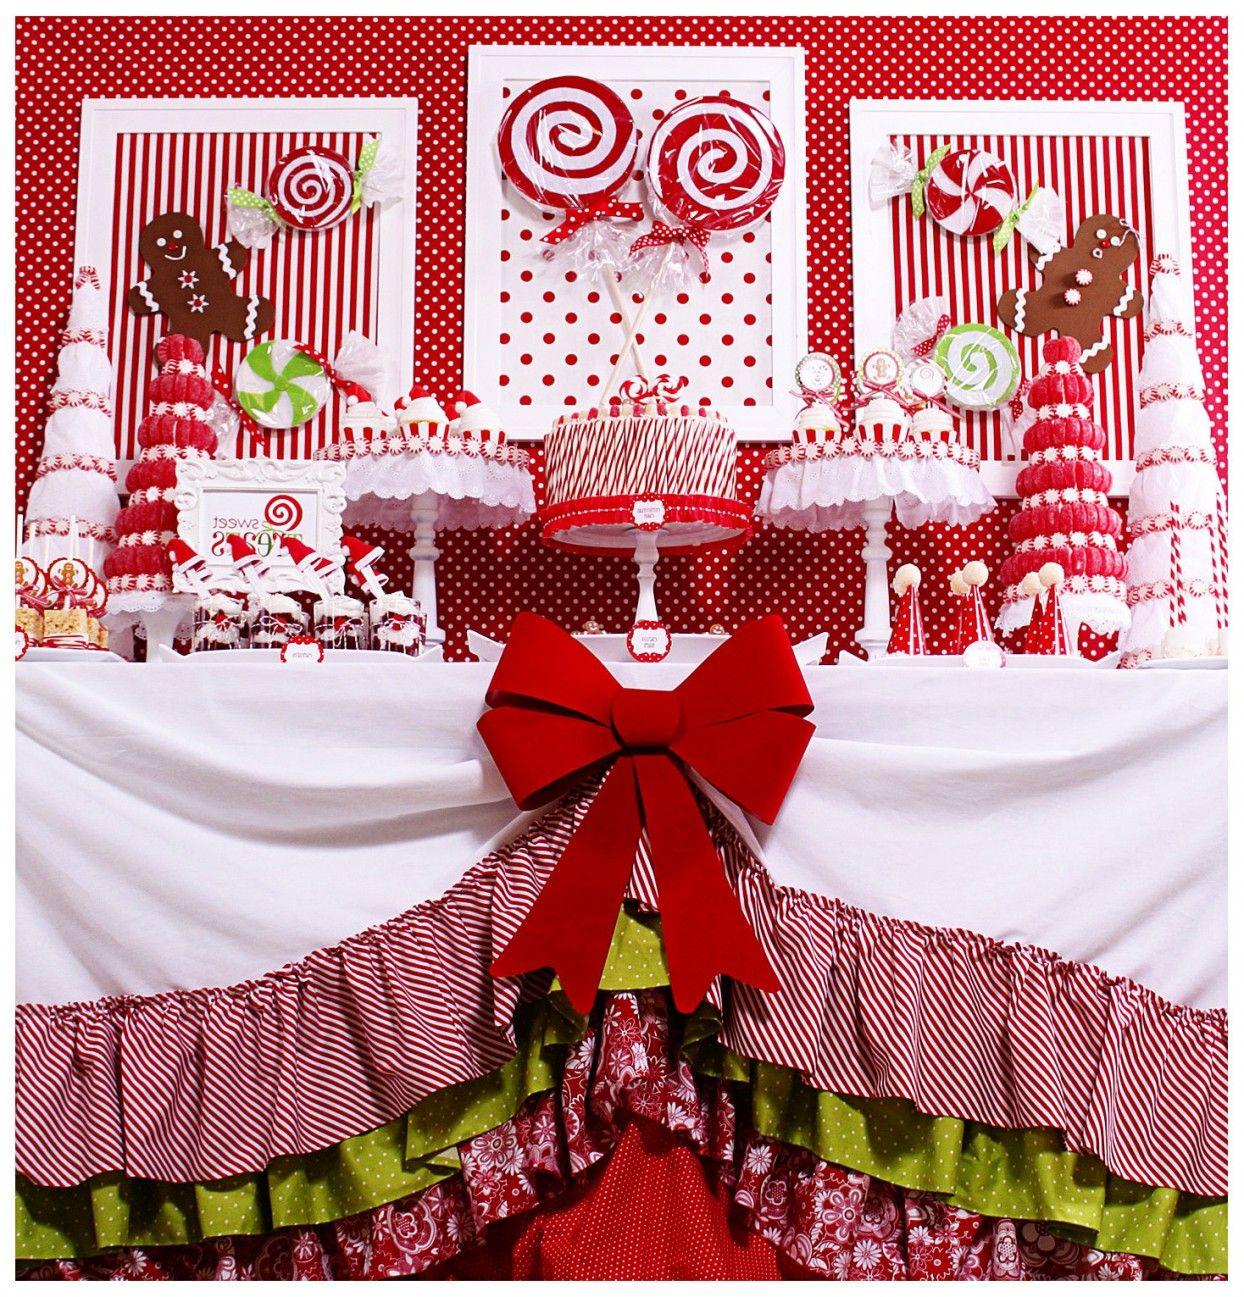 Christmas dessert table decoration ideas - Decoration Decoration Red Candy Land Christmas Dessert Table